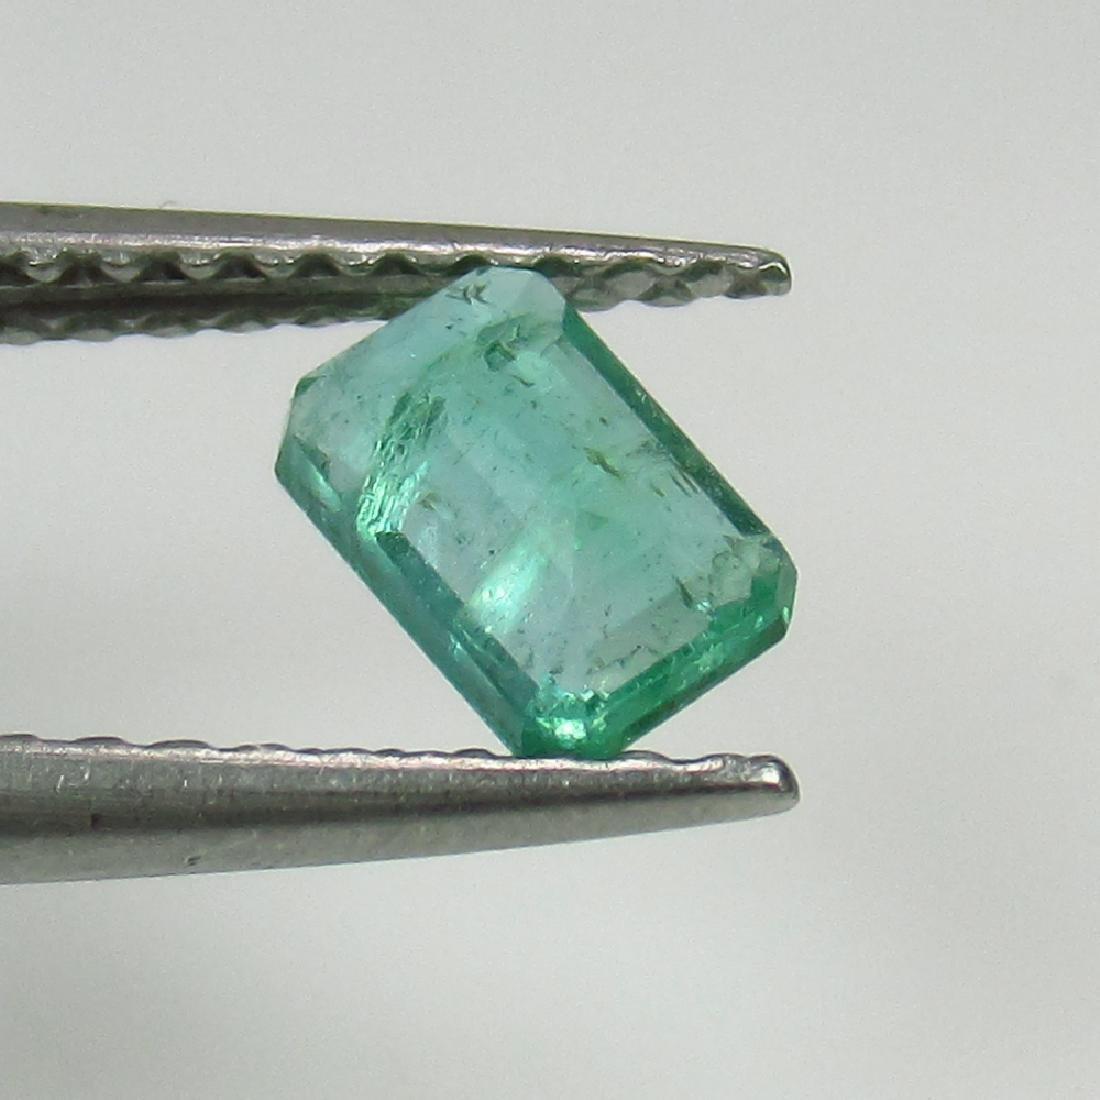 0.39 Ct Genuine Zambian Emerald 5.5X3.5 mm Octagon Cut - 2